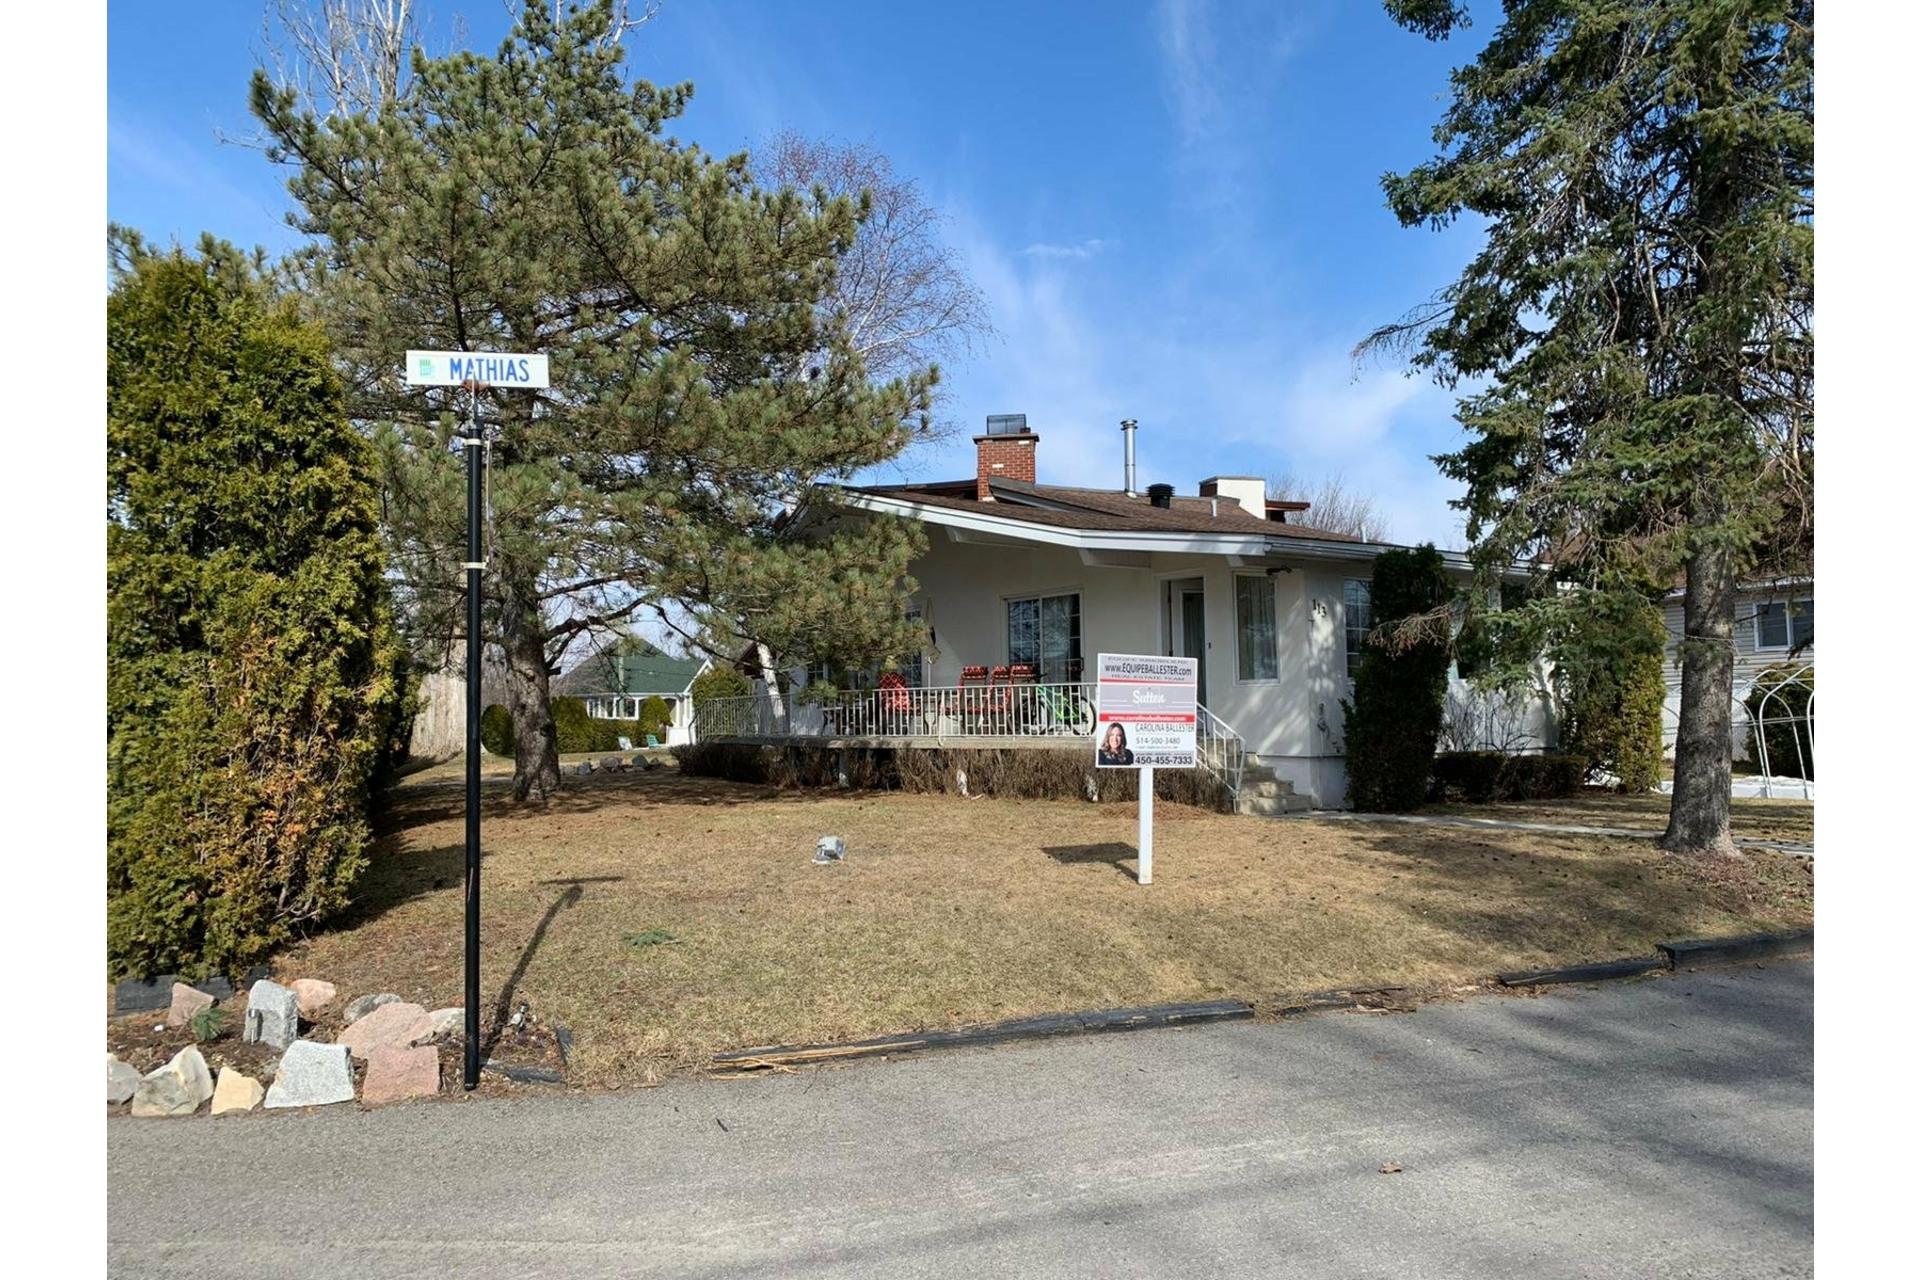 image 1 - MX - Casa sola - MX En venta Sainte-Anne-des-Plaines - 7 habitaciones